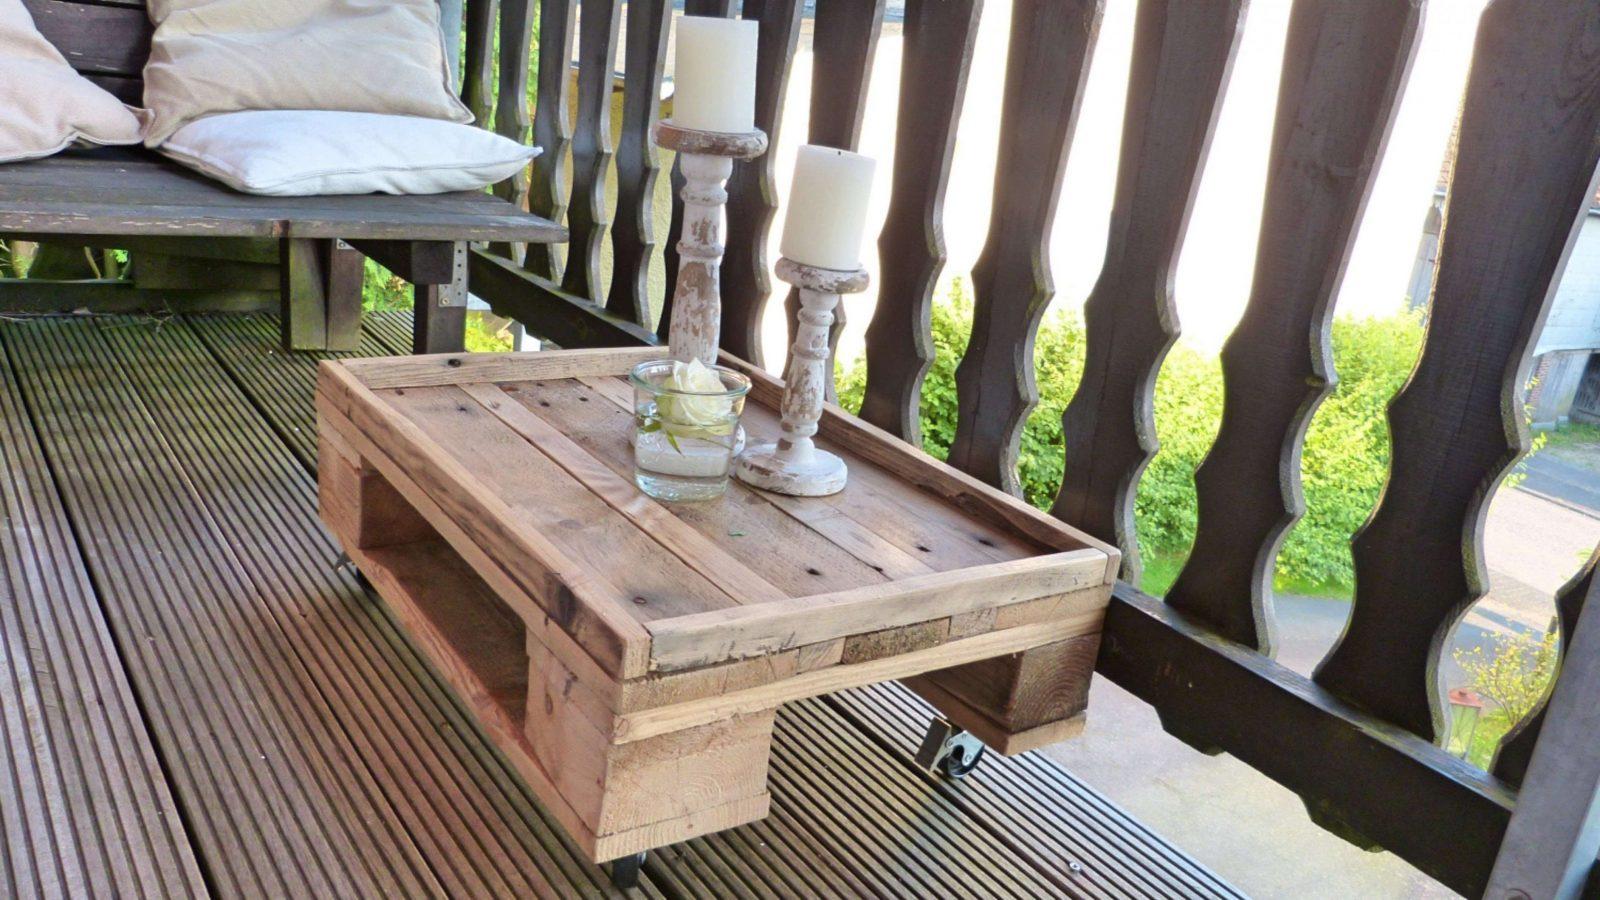 gartenliege selber bauen outdoor kche selber bauen hornbach einzigartig holzzaun selber bauen. Black Bedroom Furniture Sets. Home Design Ideas